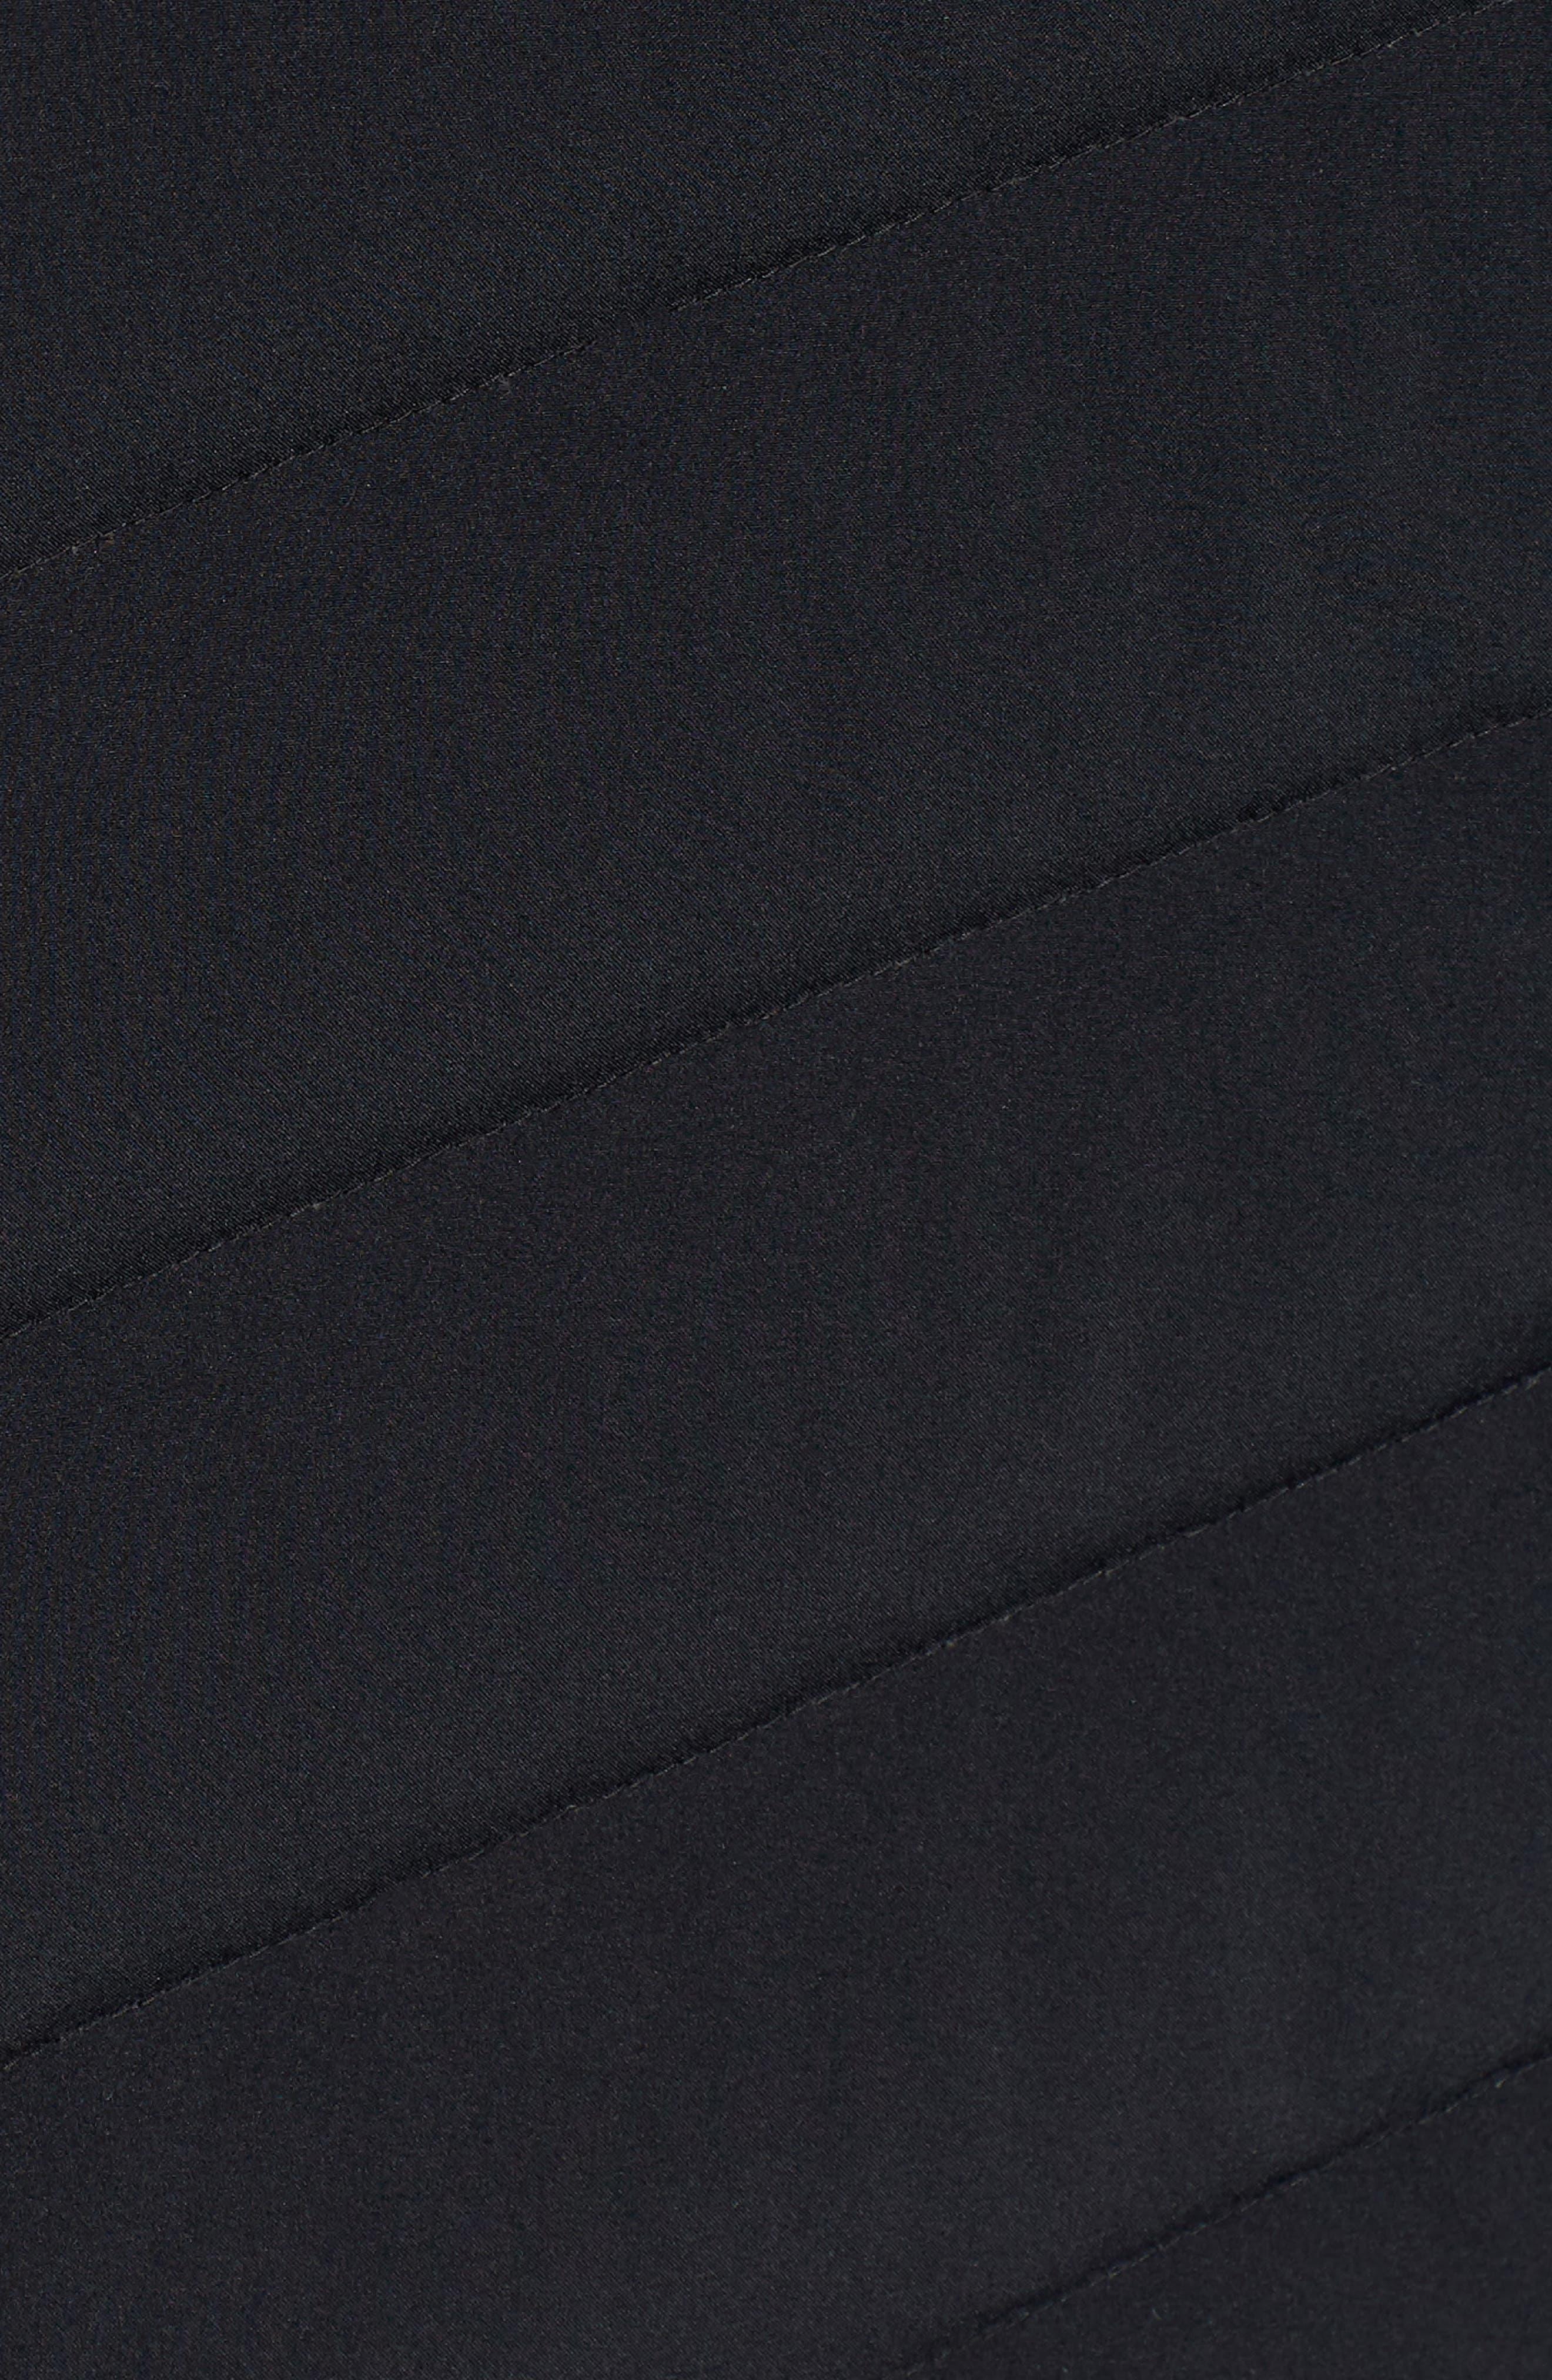 MARC NEW YORK, Delavan Down Hooded Jacket, Alternate thumbnail 6, color, BLACK